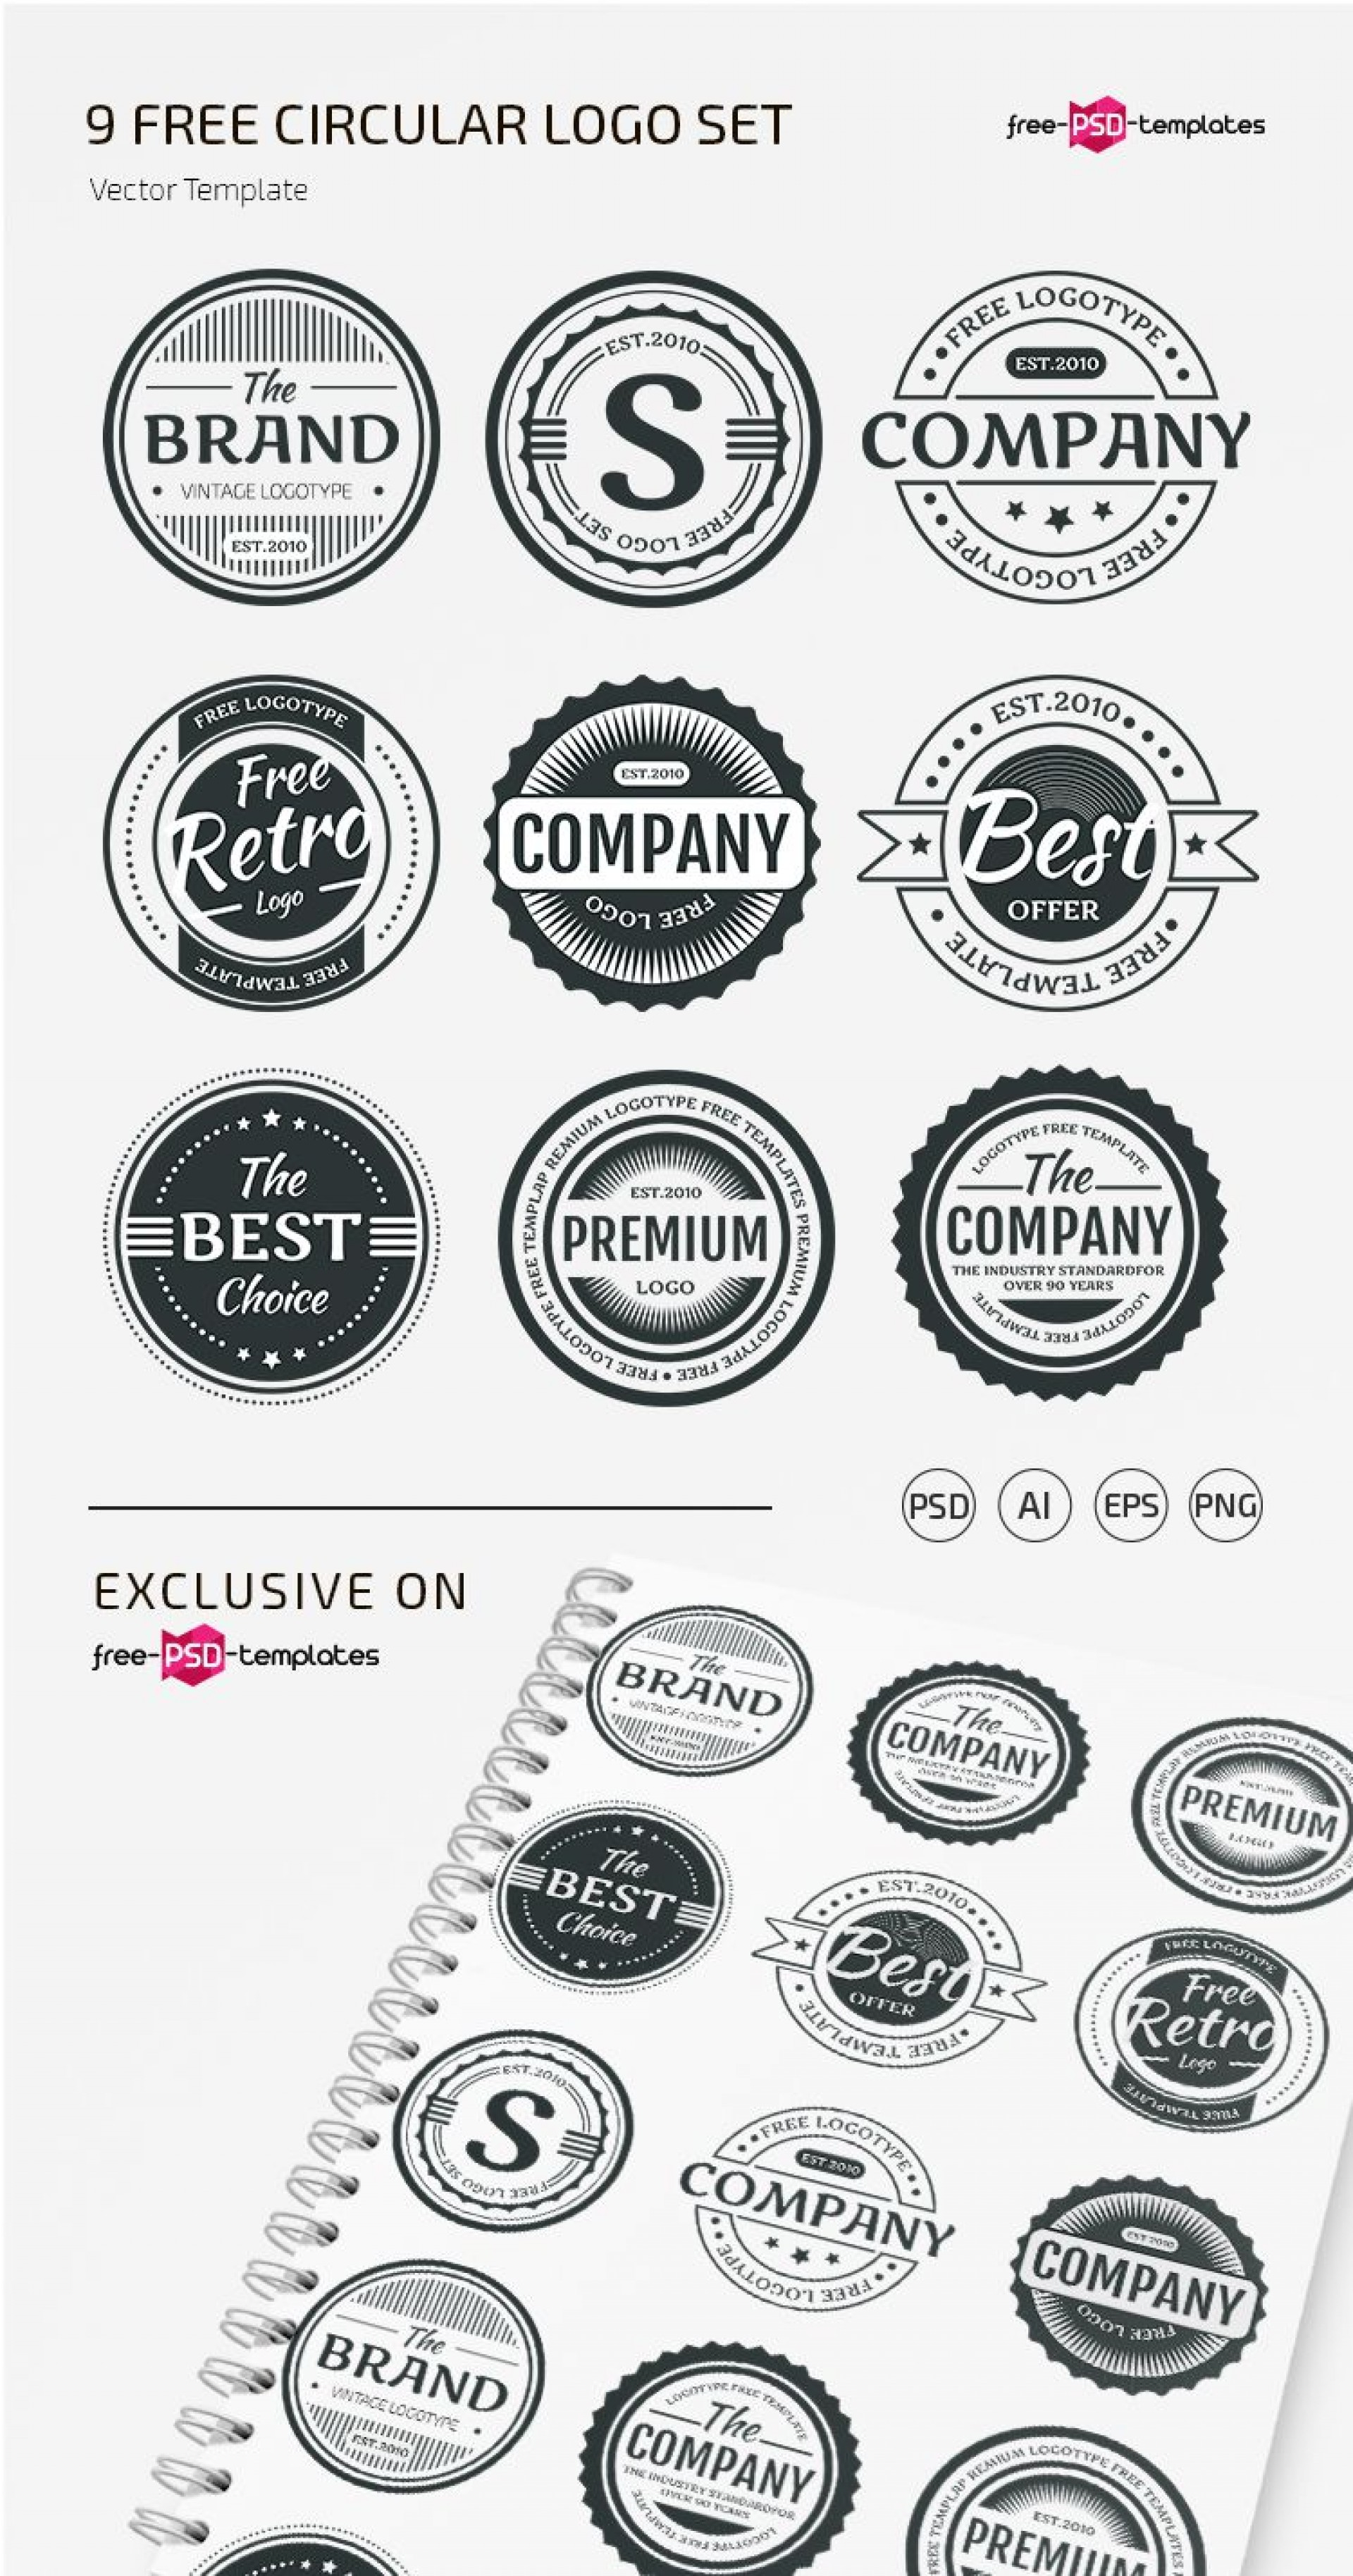 009 Singular Free Psd Logo Template High Resolution  Templates Design For Photographer Dj1920